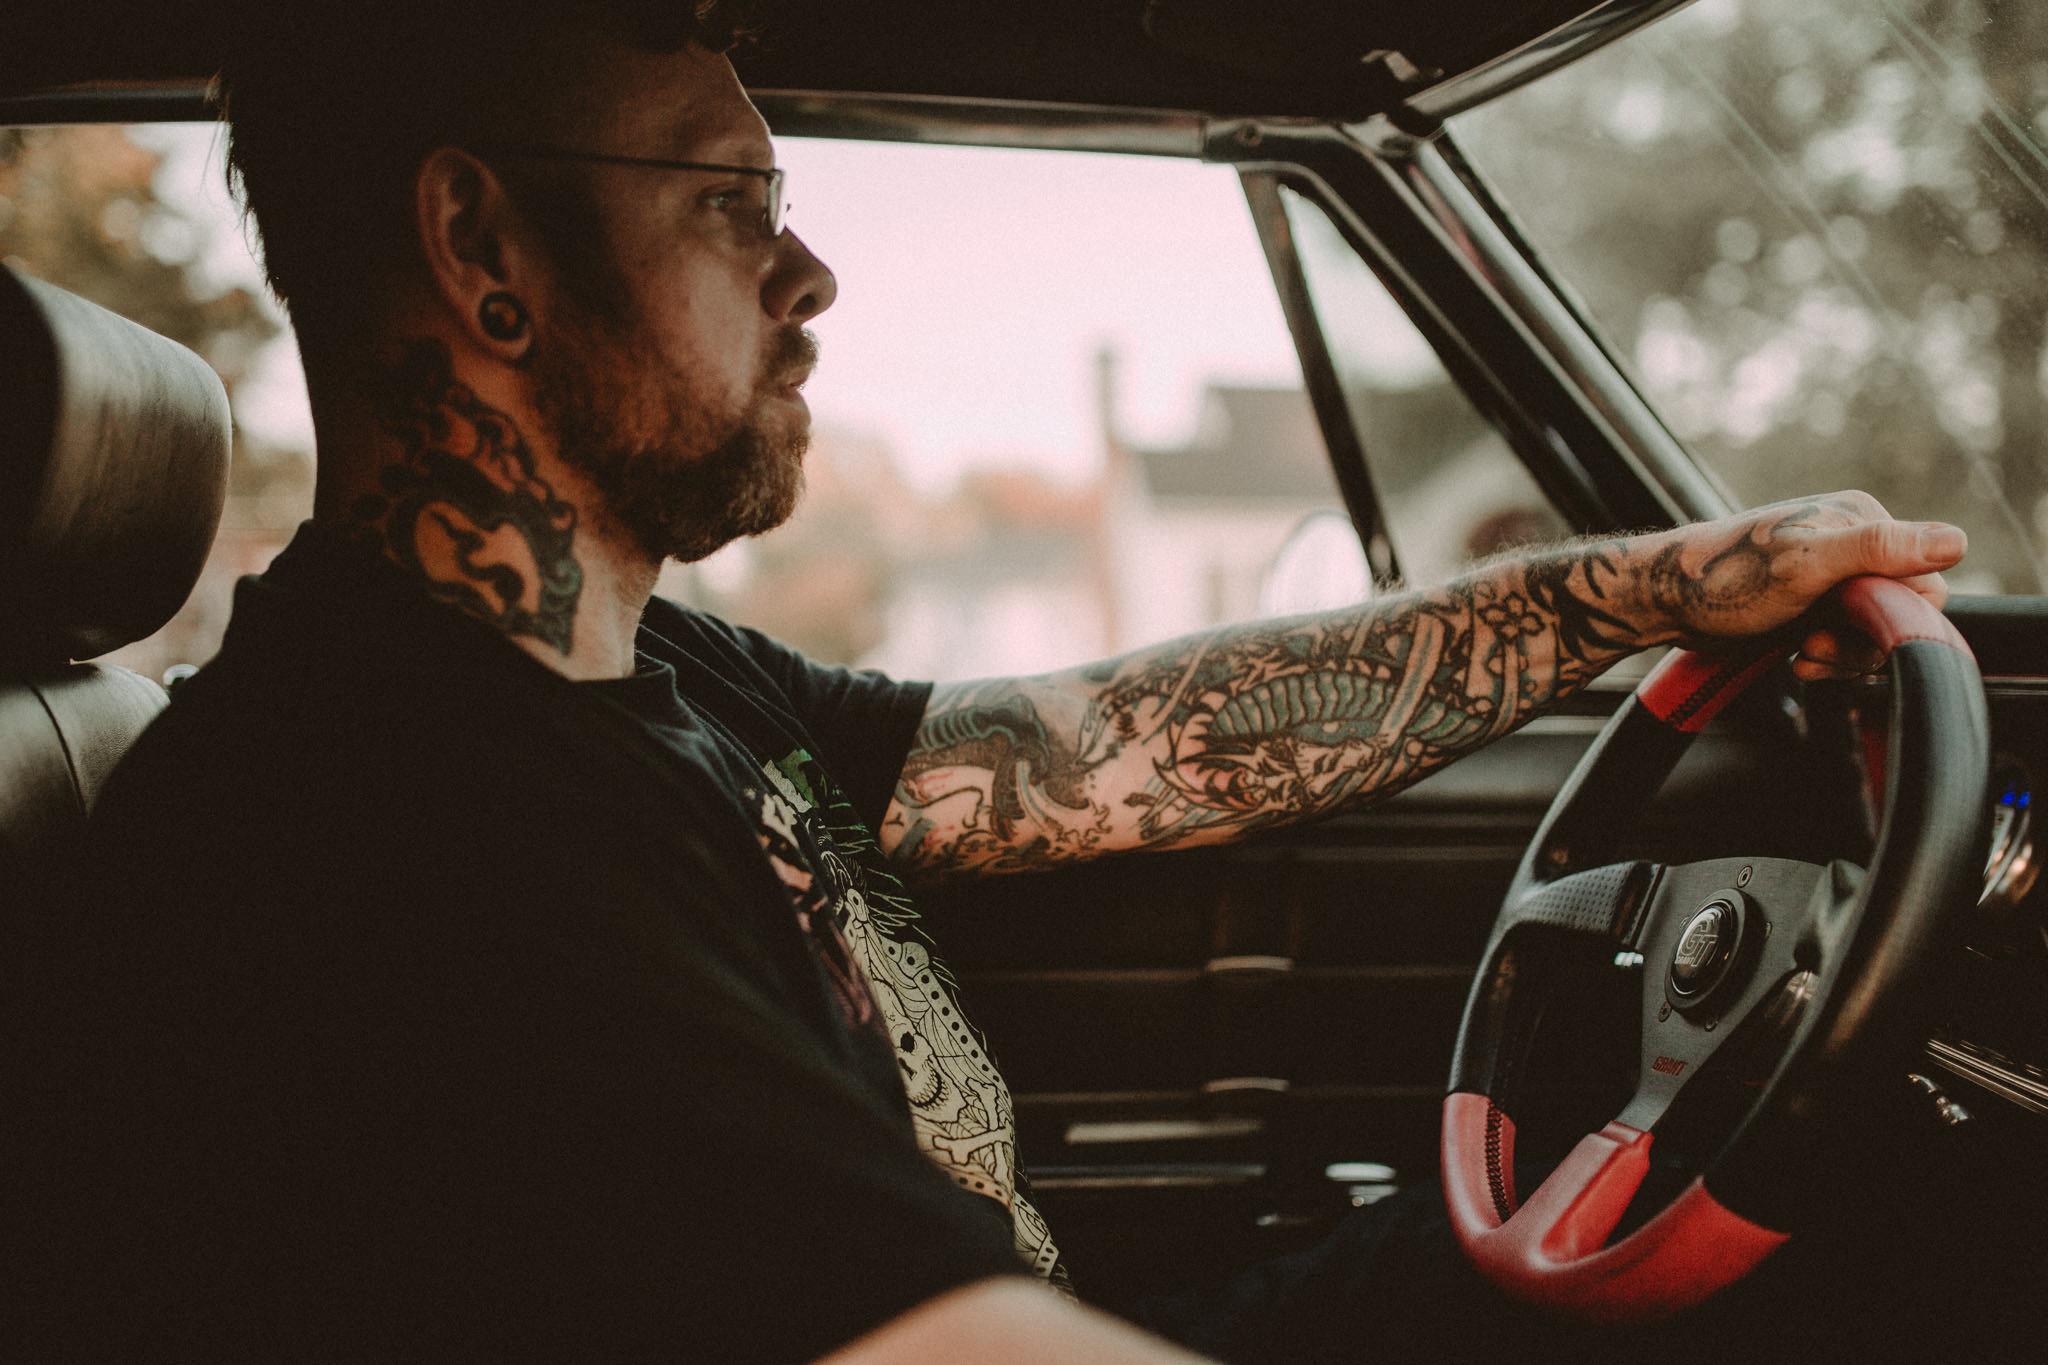 6-Hour Tattoo Session